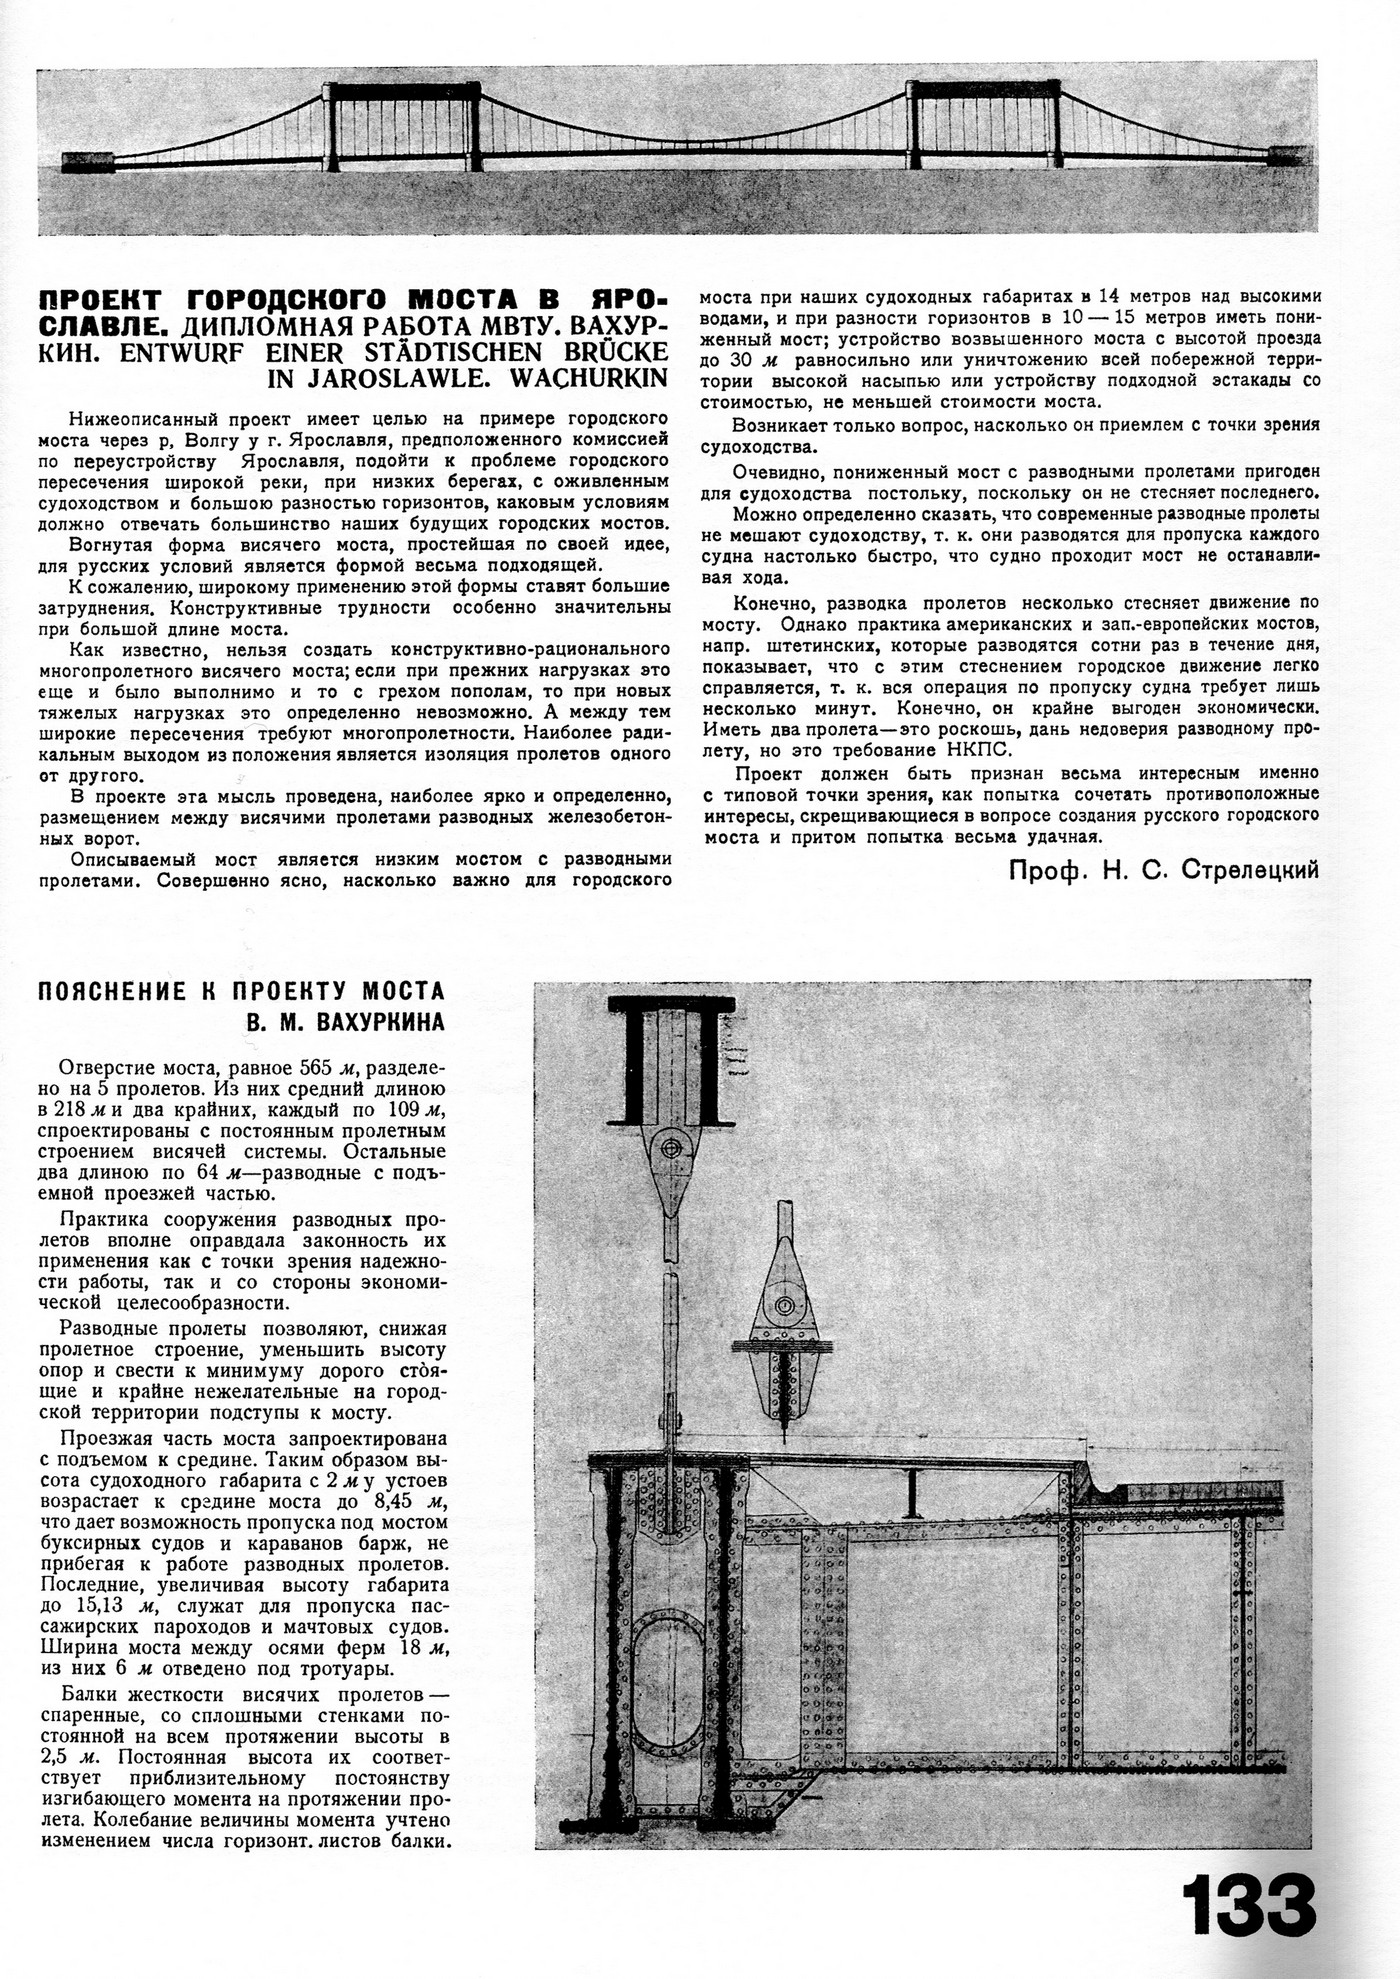 tehne.com-sa-1926-5-6-1400-0025